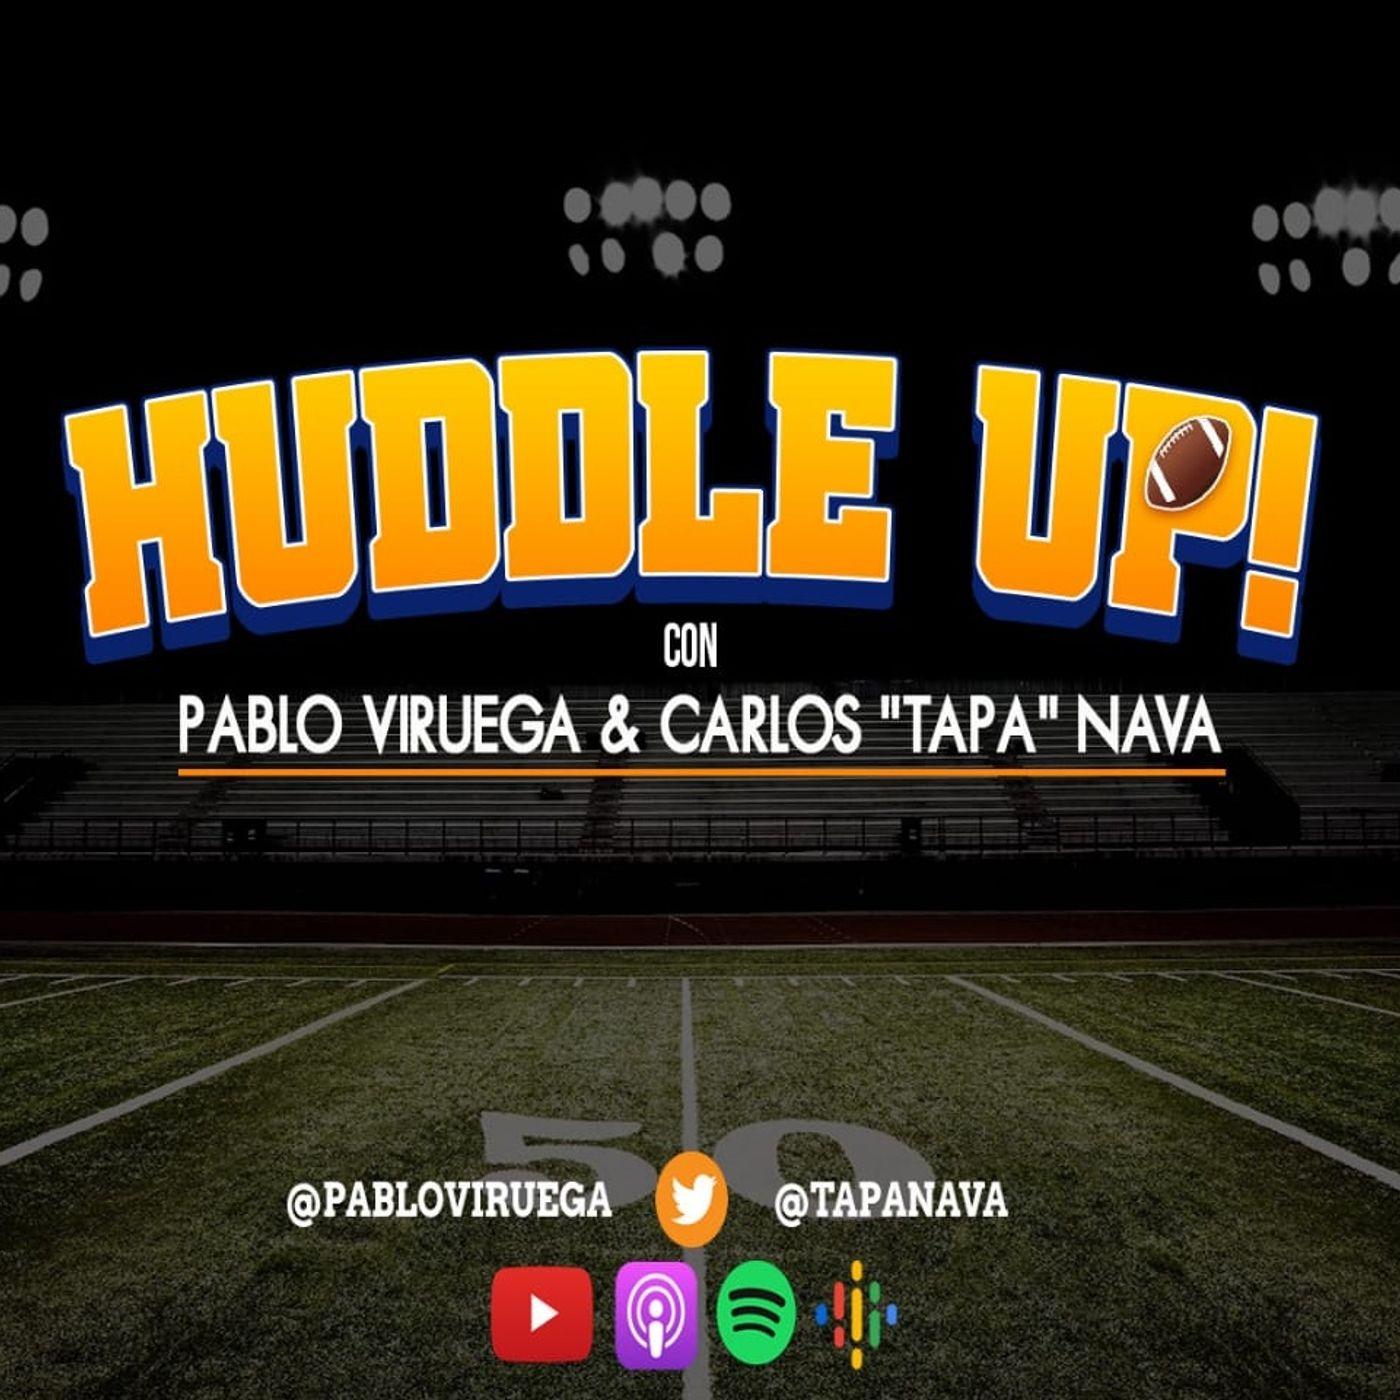 #HuddleUP Cam Newton cortado Mac Jones titular. Futuro de los latinos #NFL @TapaNava @PabloViruega